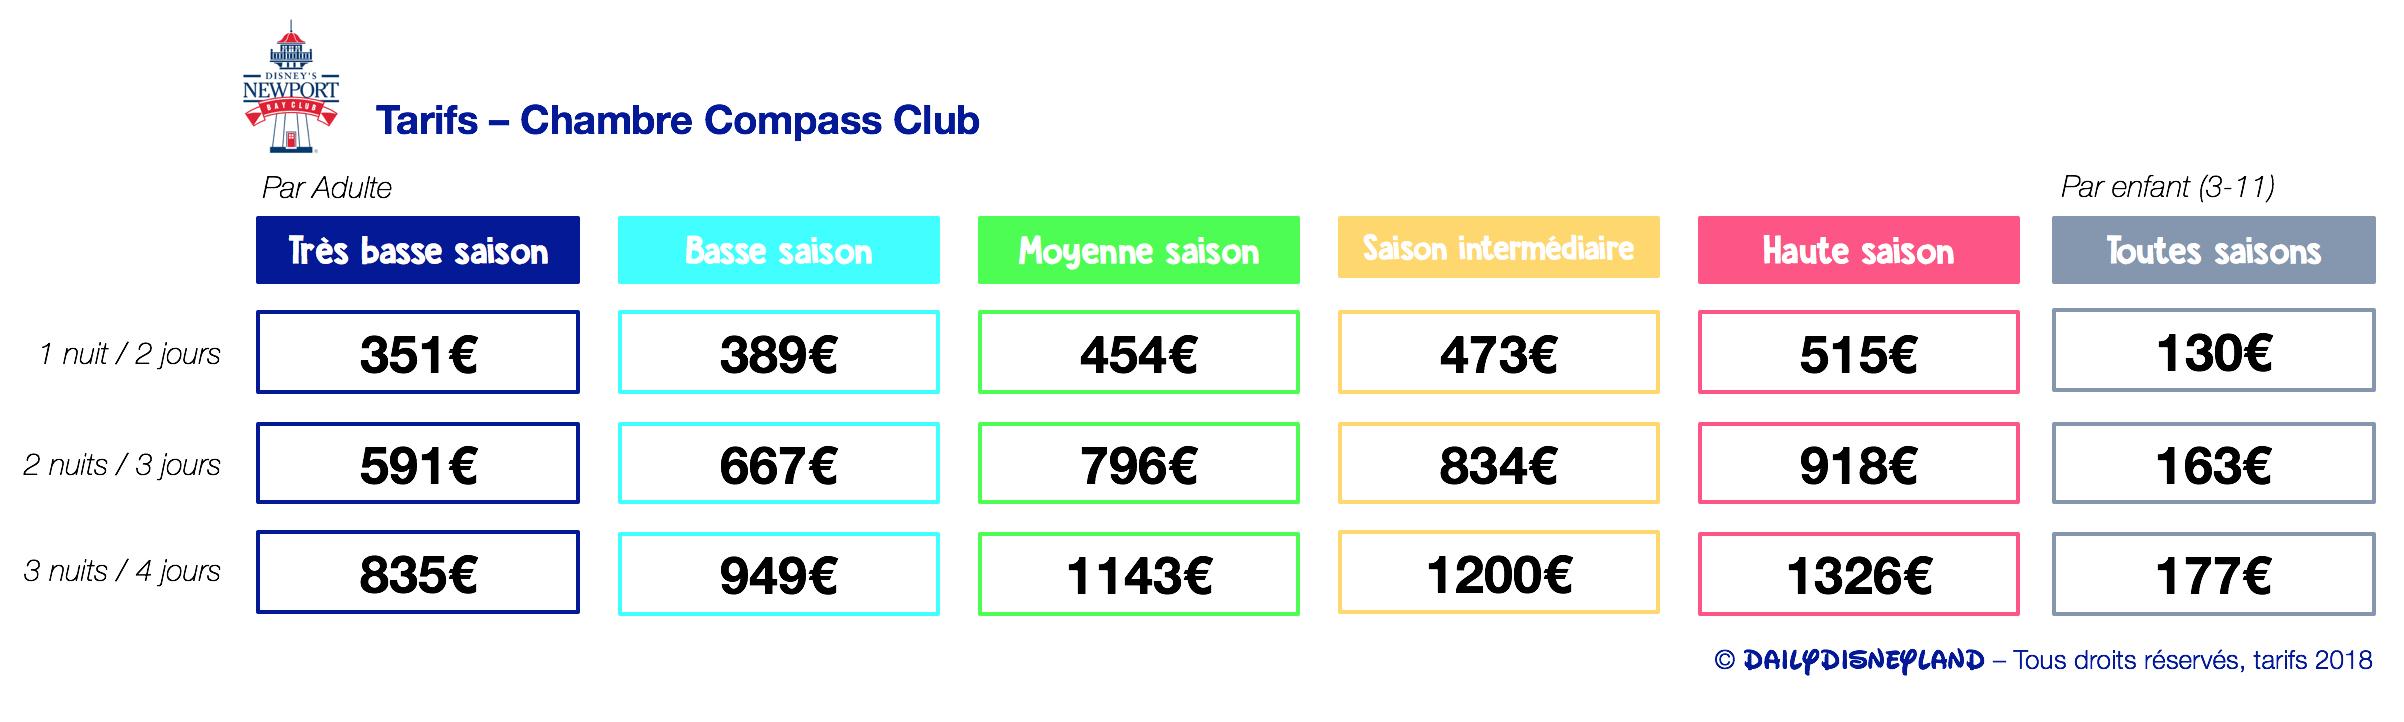 Tarifs Disney's New Port Bay Club, chambre Compass Club Disneyland Paris pas cher